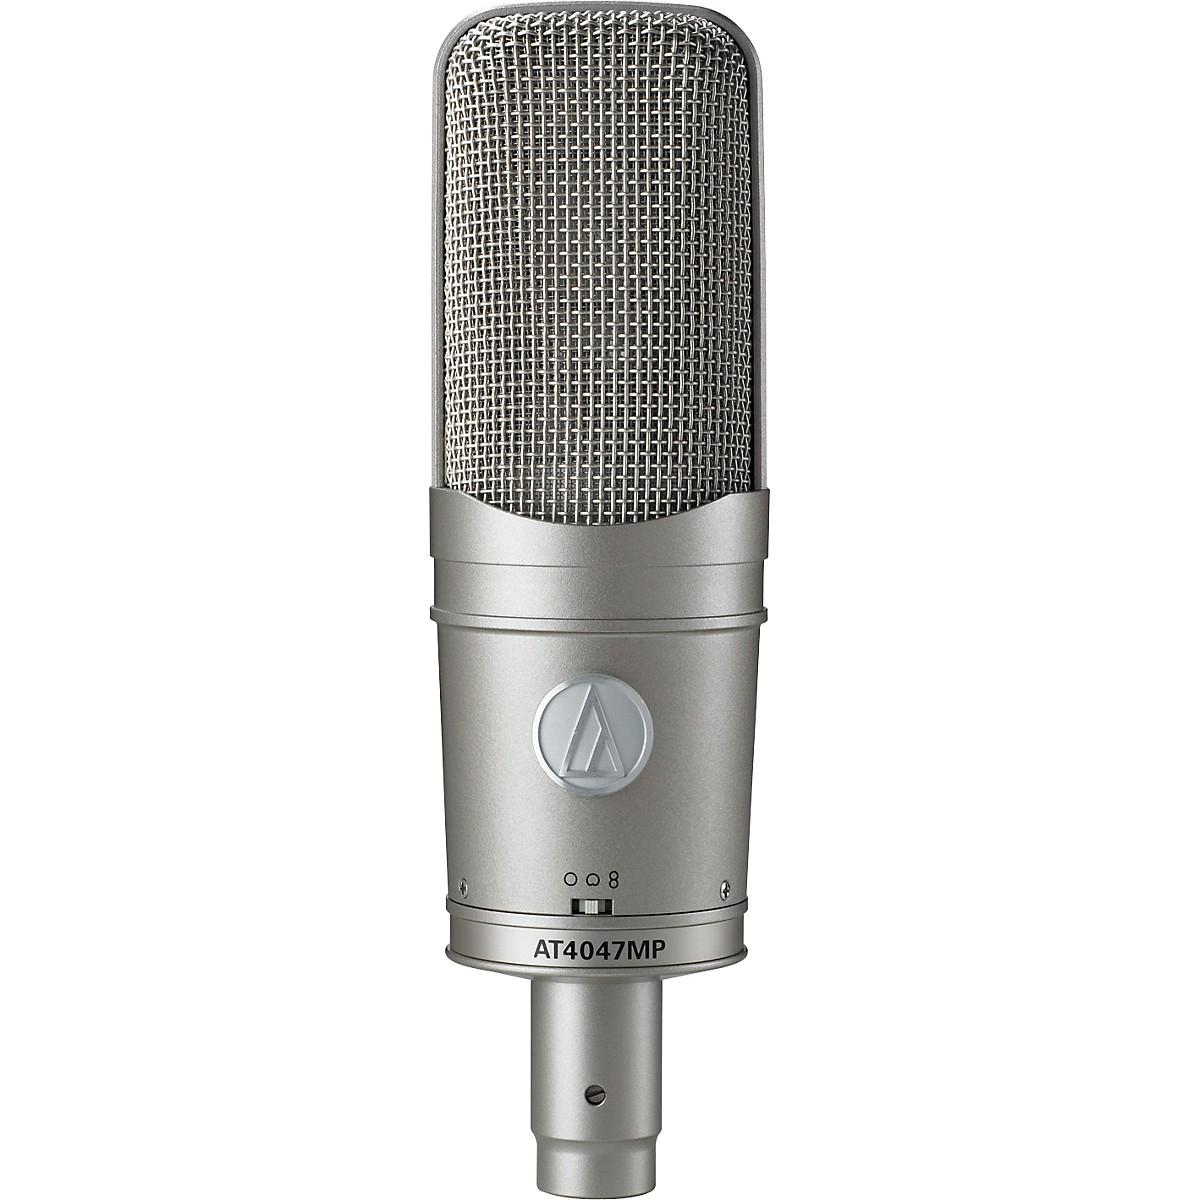 Audio-Technica AT4047MP Multi-Pattern Condenser Microphone